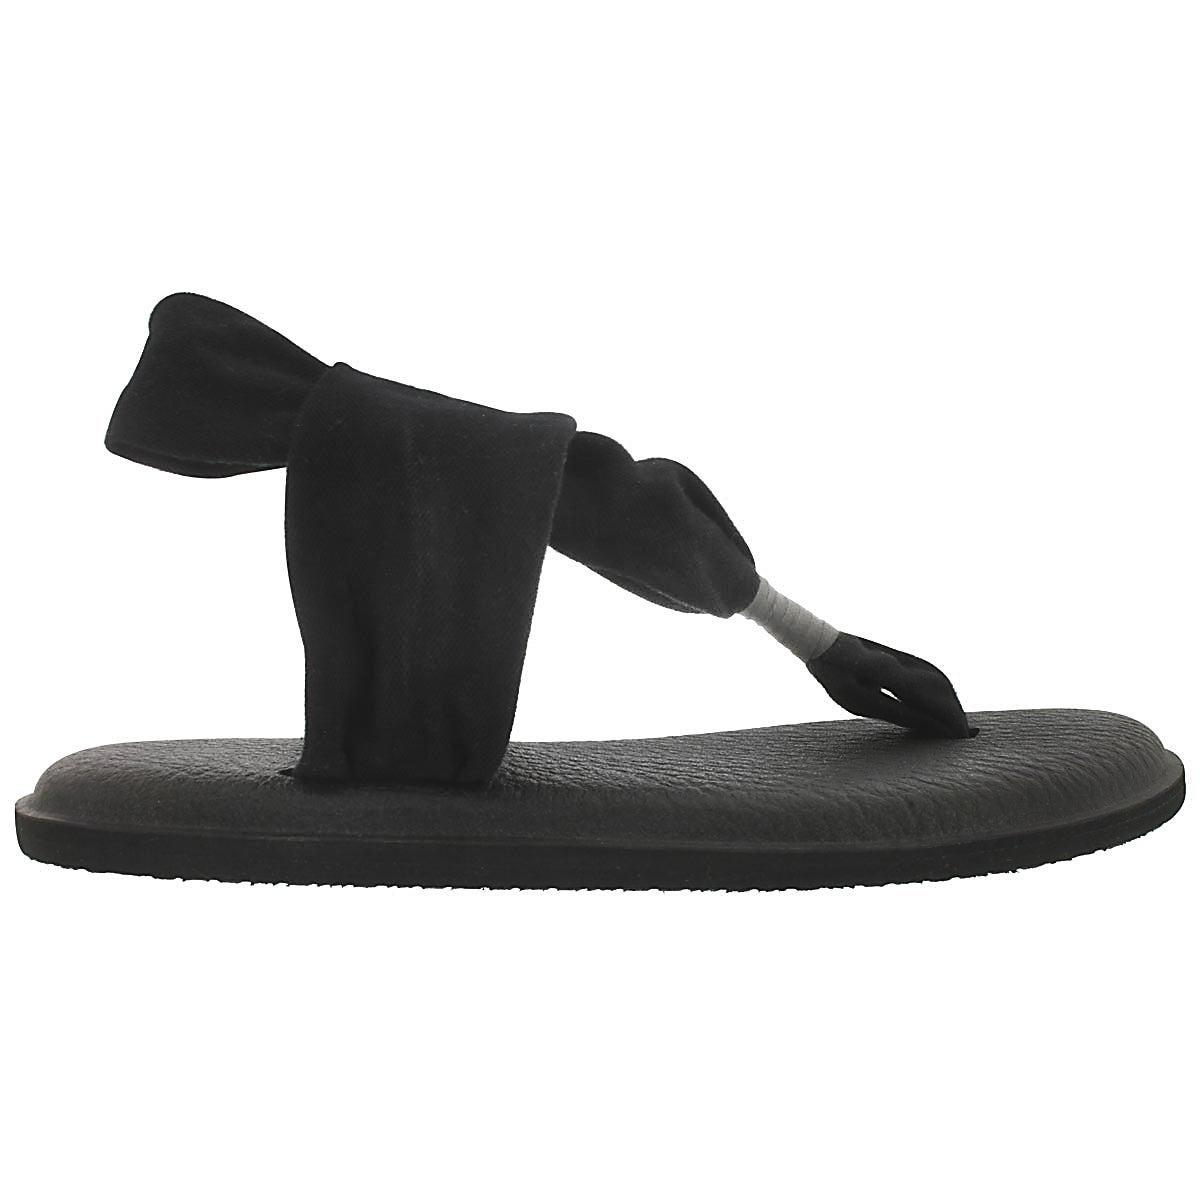 Lds Yoga Sling black thong sandal